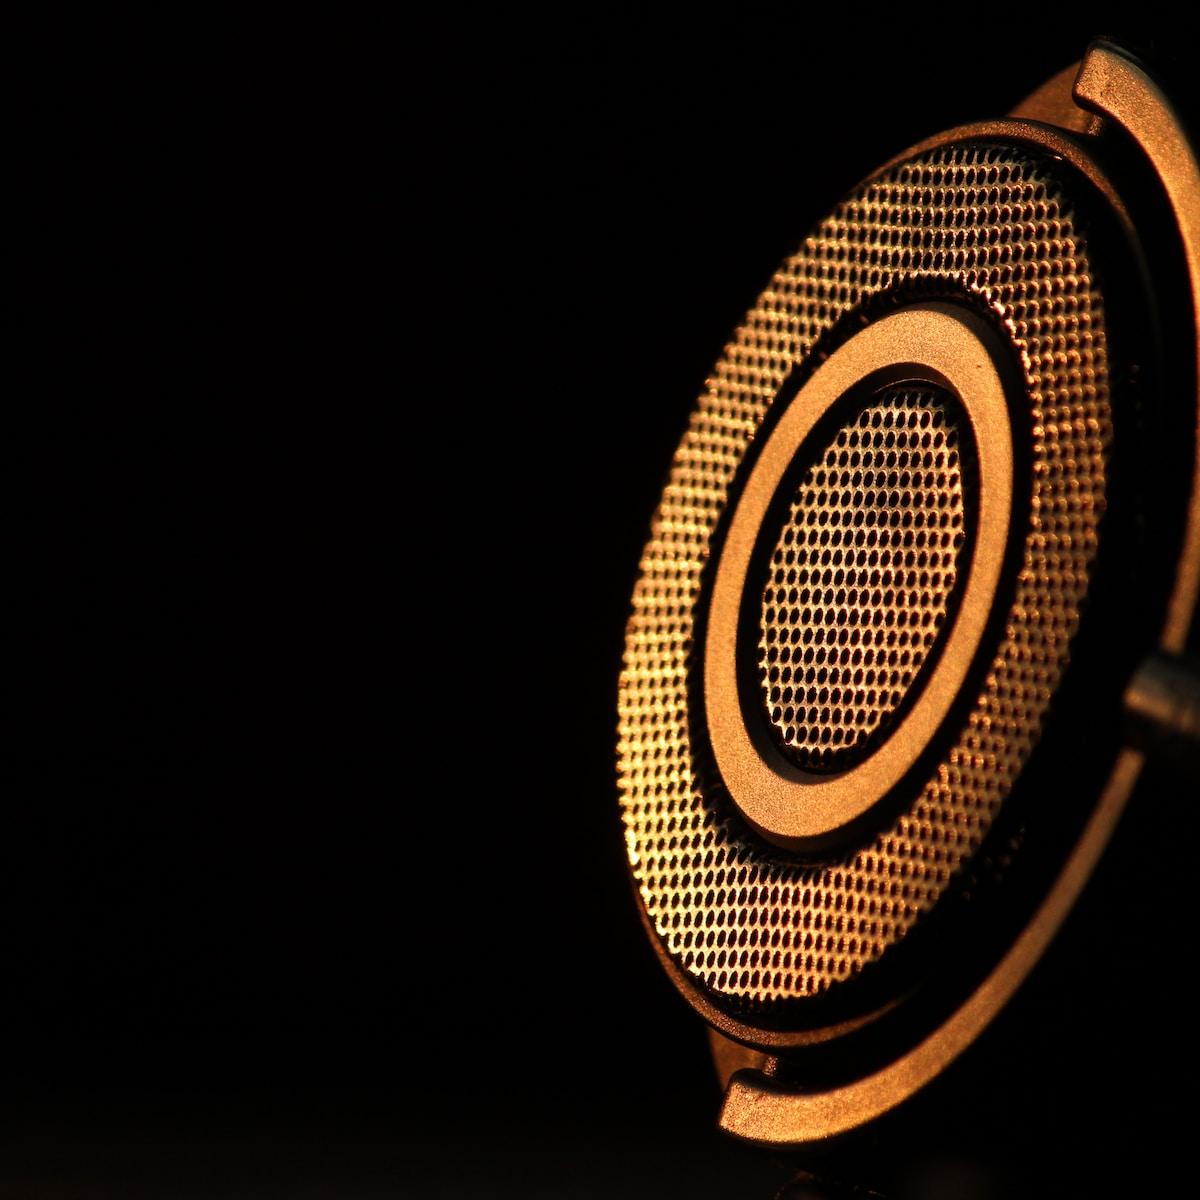 chromecast audioの音質をさらに良くする設定があった